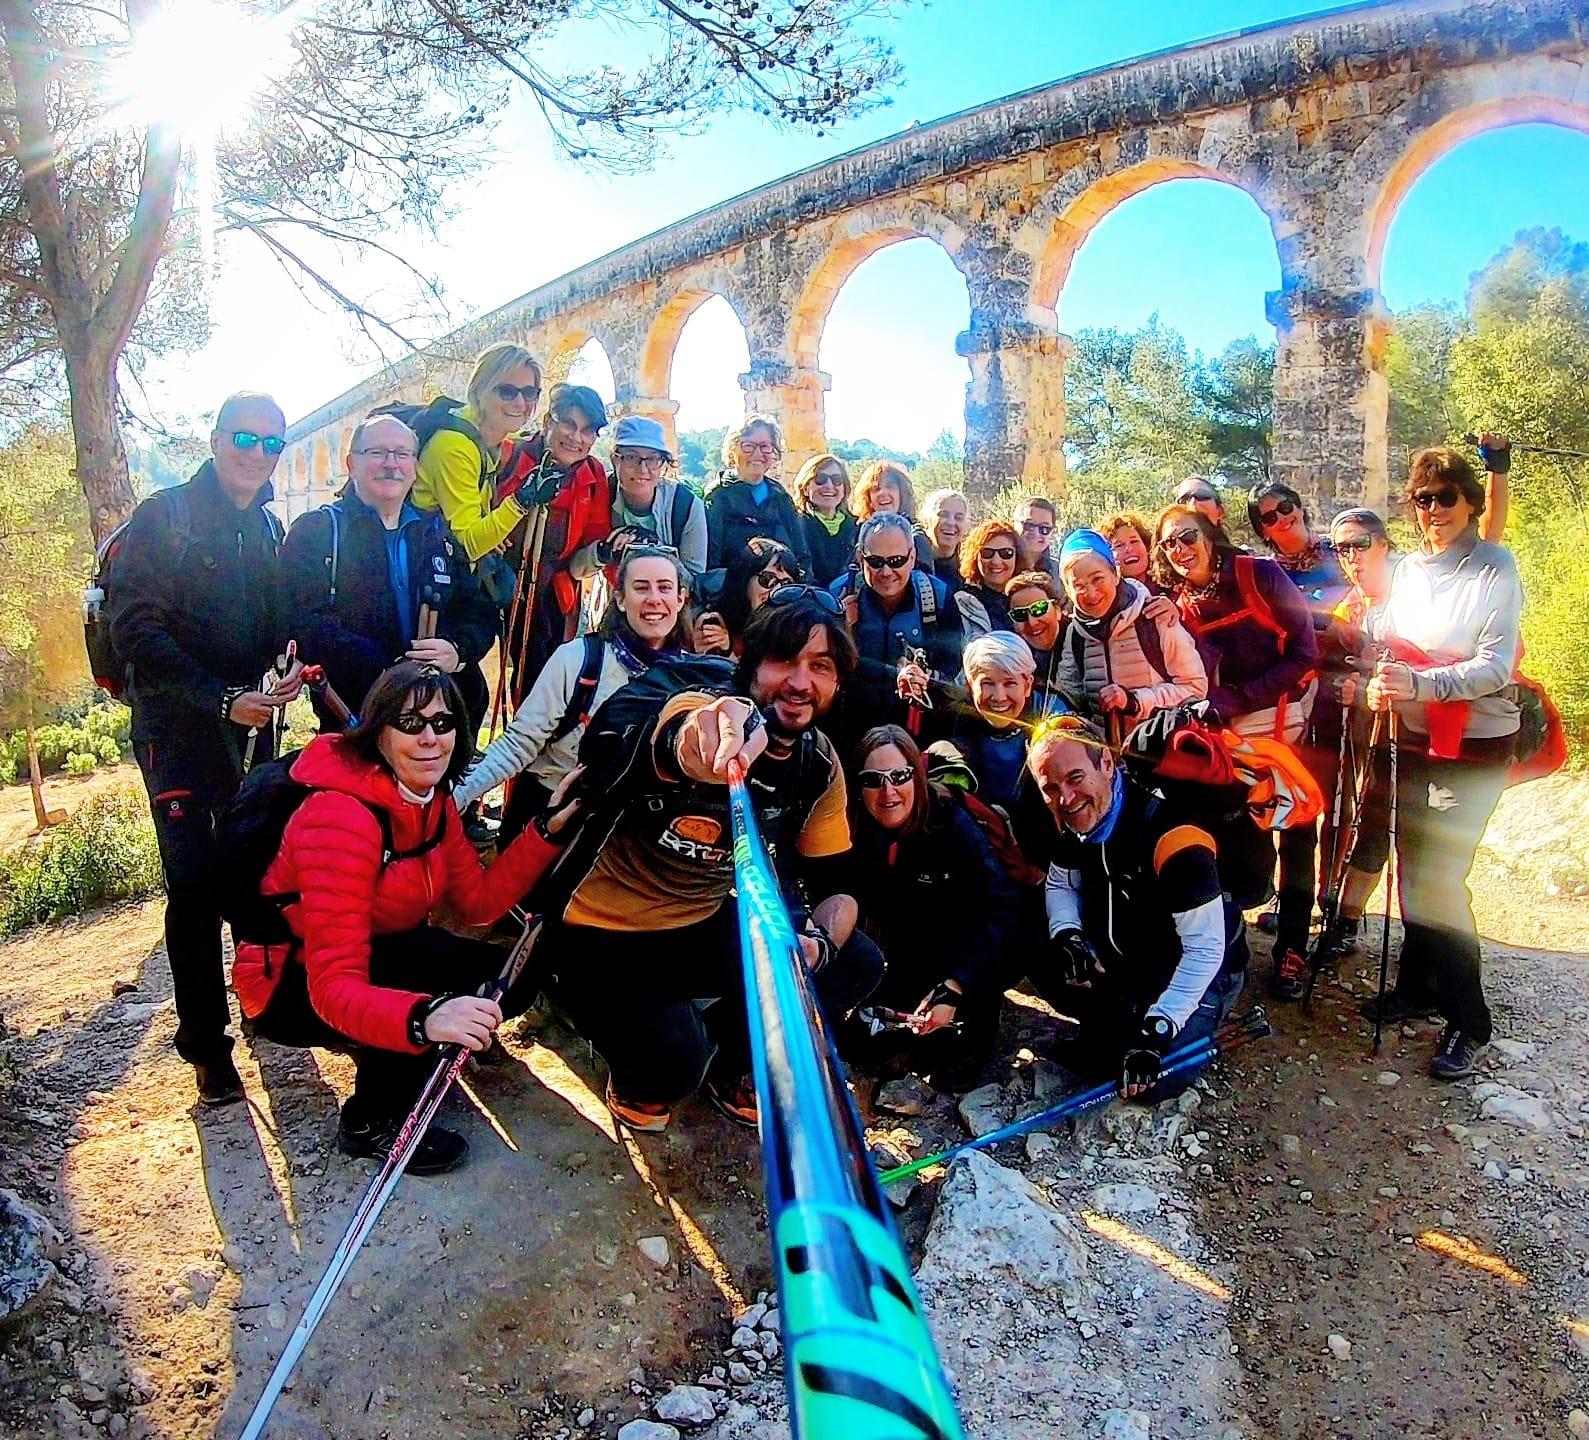 Vilaseca – Tarragona: 4rta etapa de la travessa Bendhora completada!